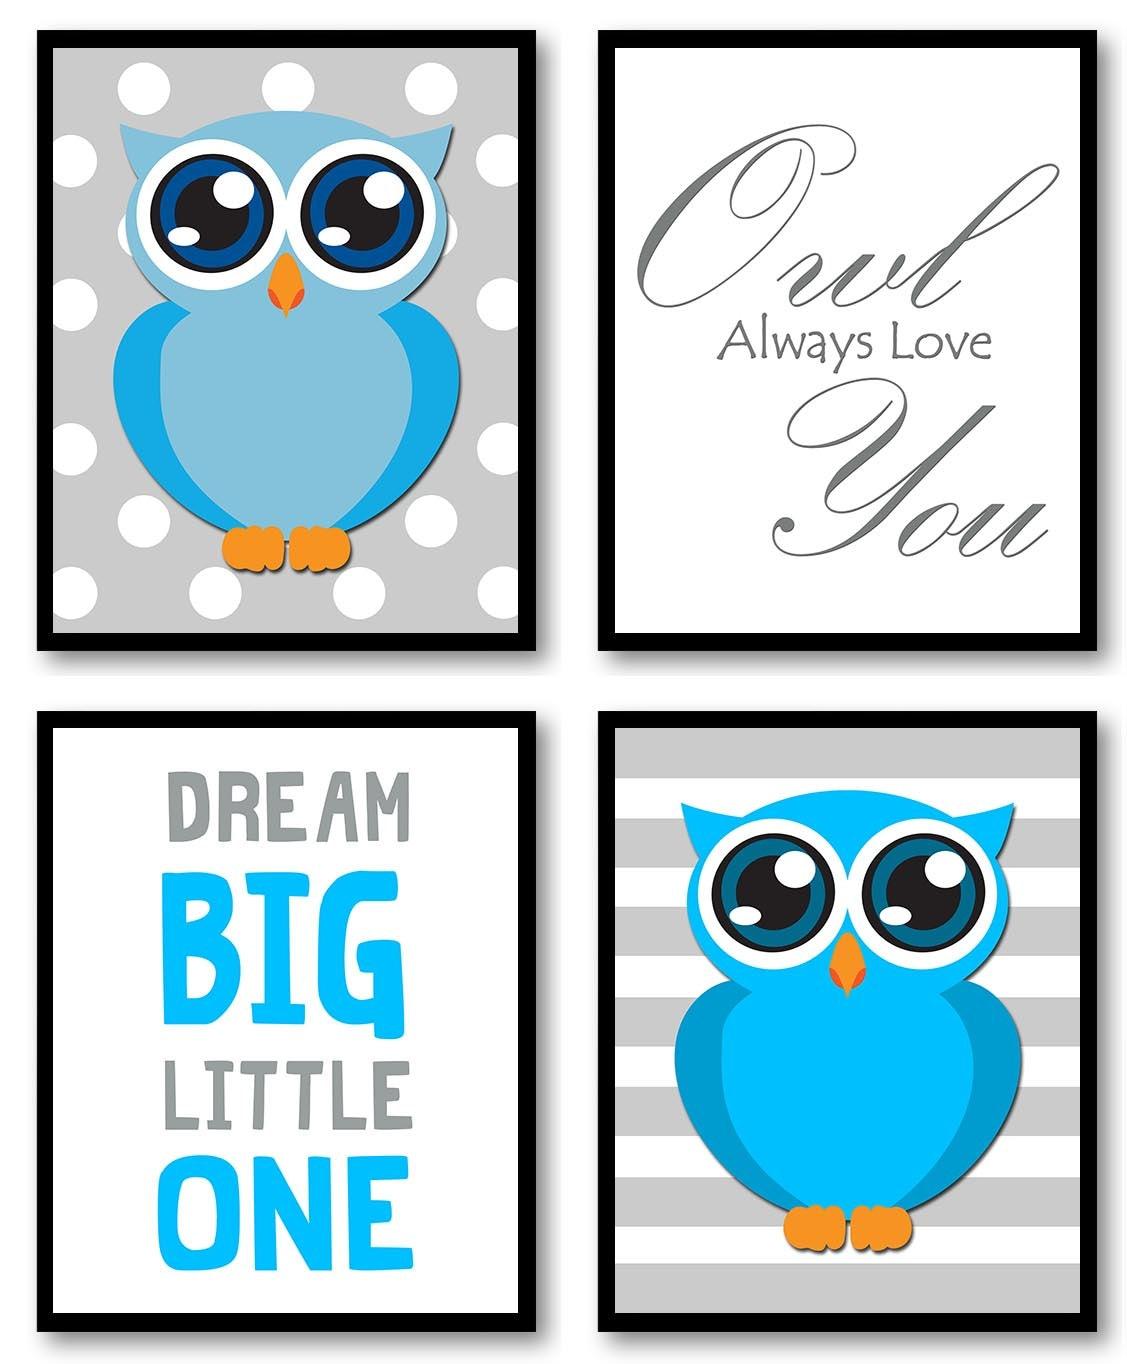 Owl Nursery Art Set of 4 Prints Blue Grey Gray Polka Dots Dream Big Little One Owl Always Love You C